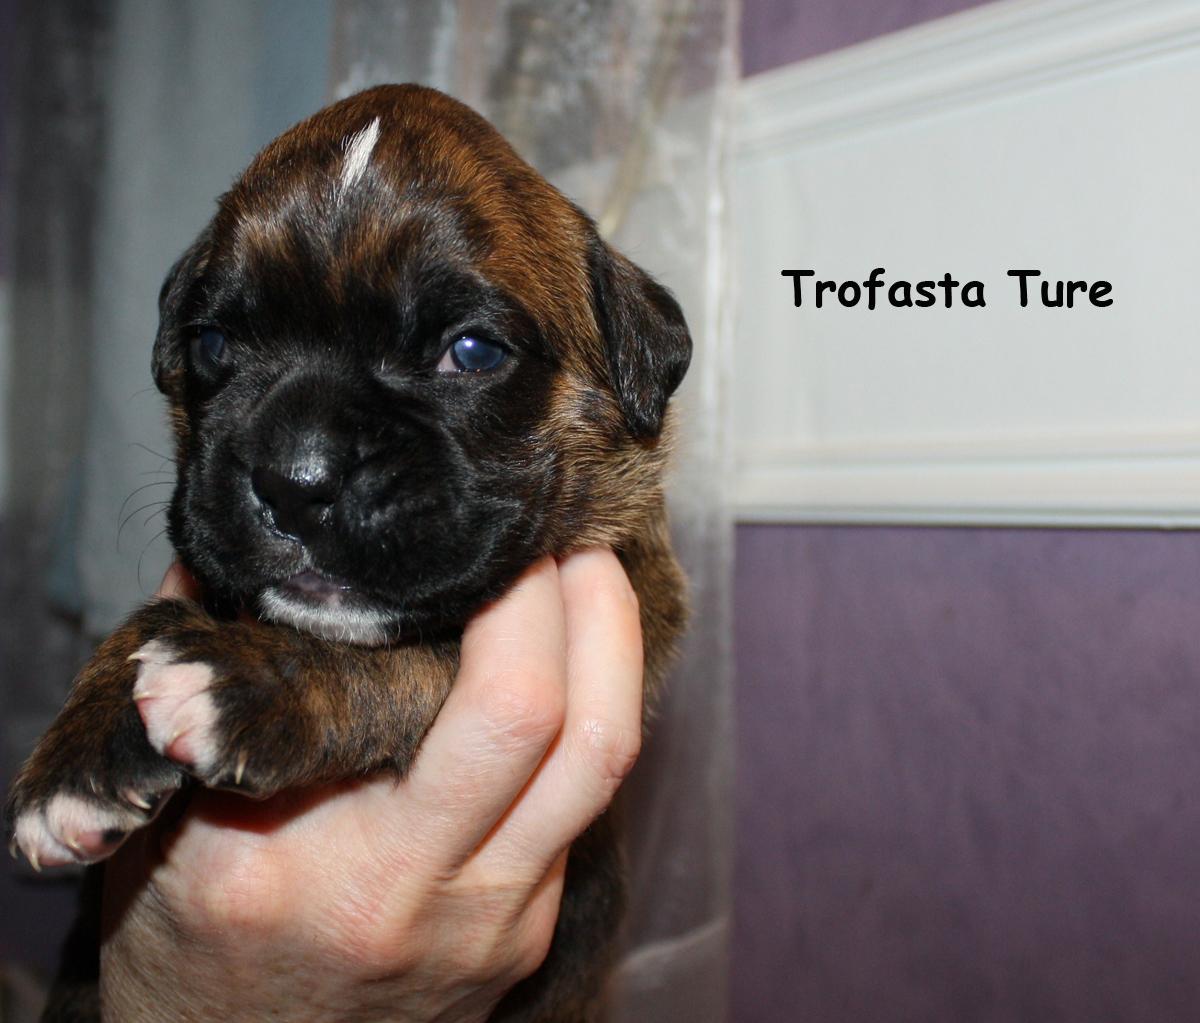 trofasta-ture-2v